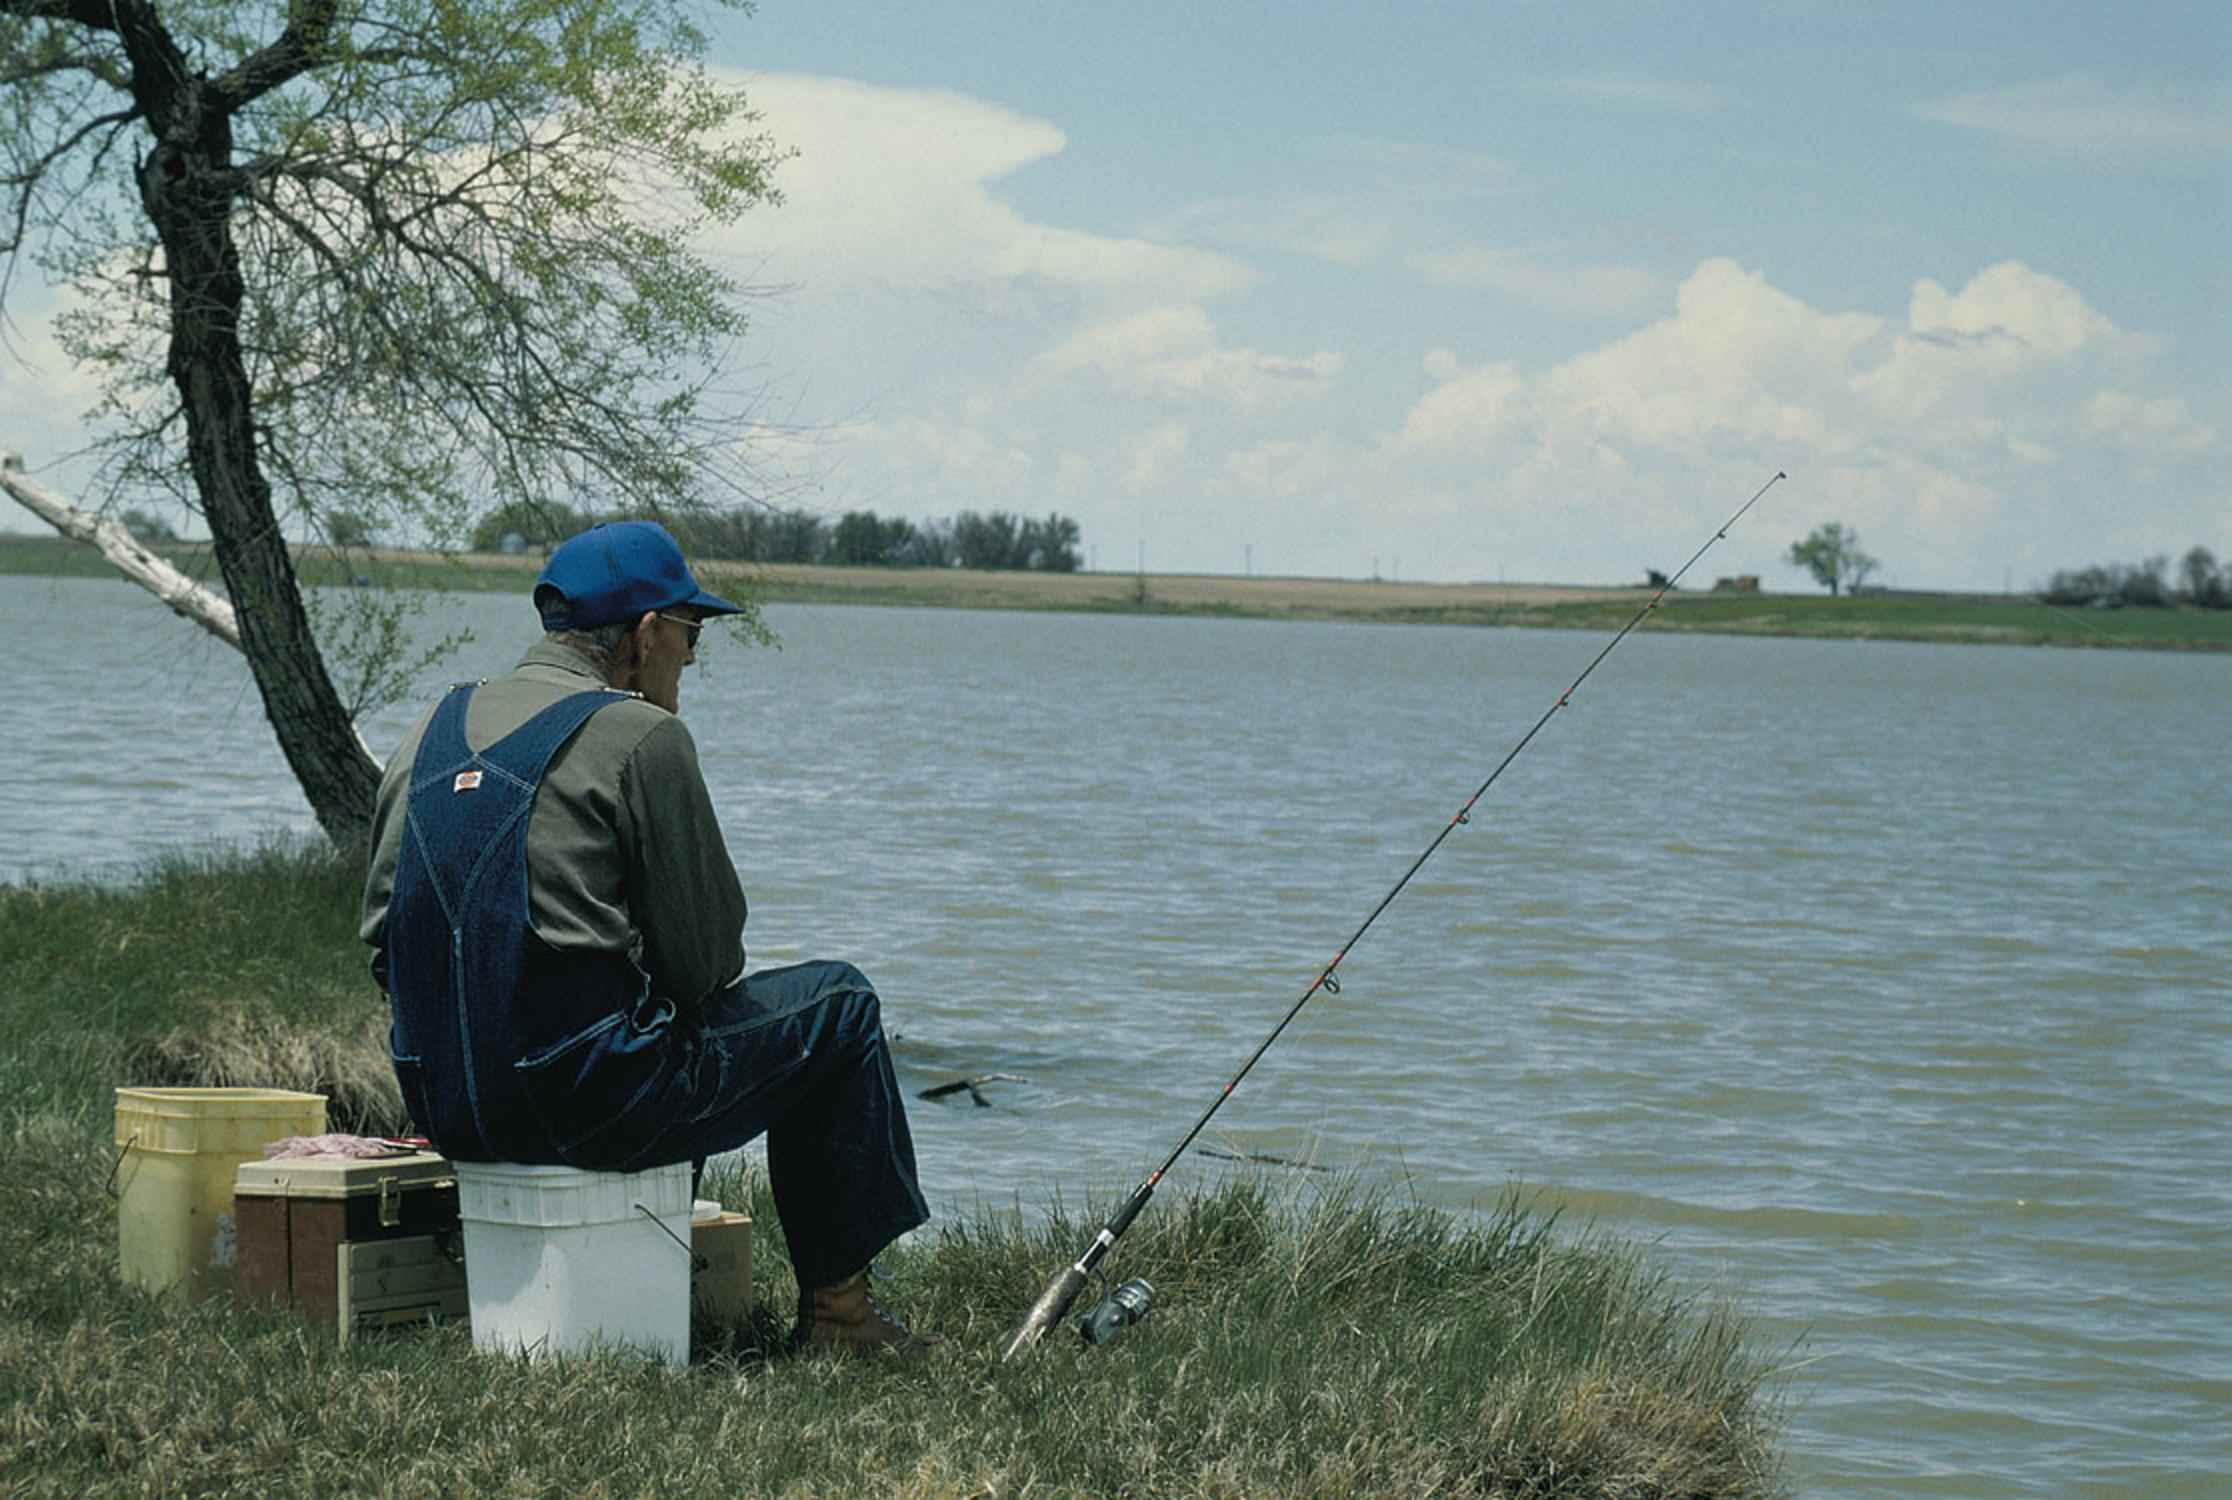 Old_man_fishing.jpg